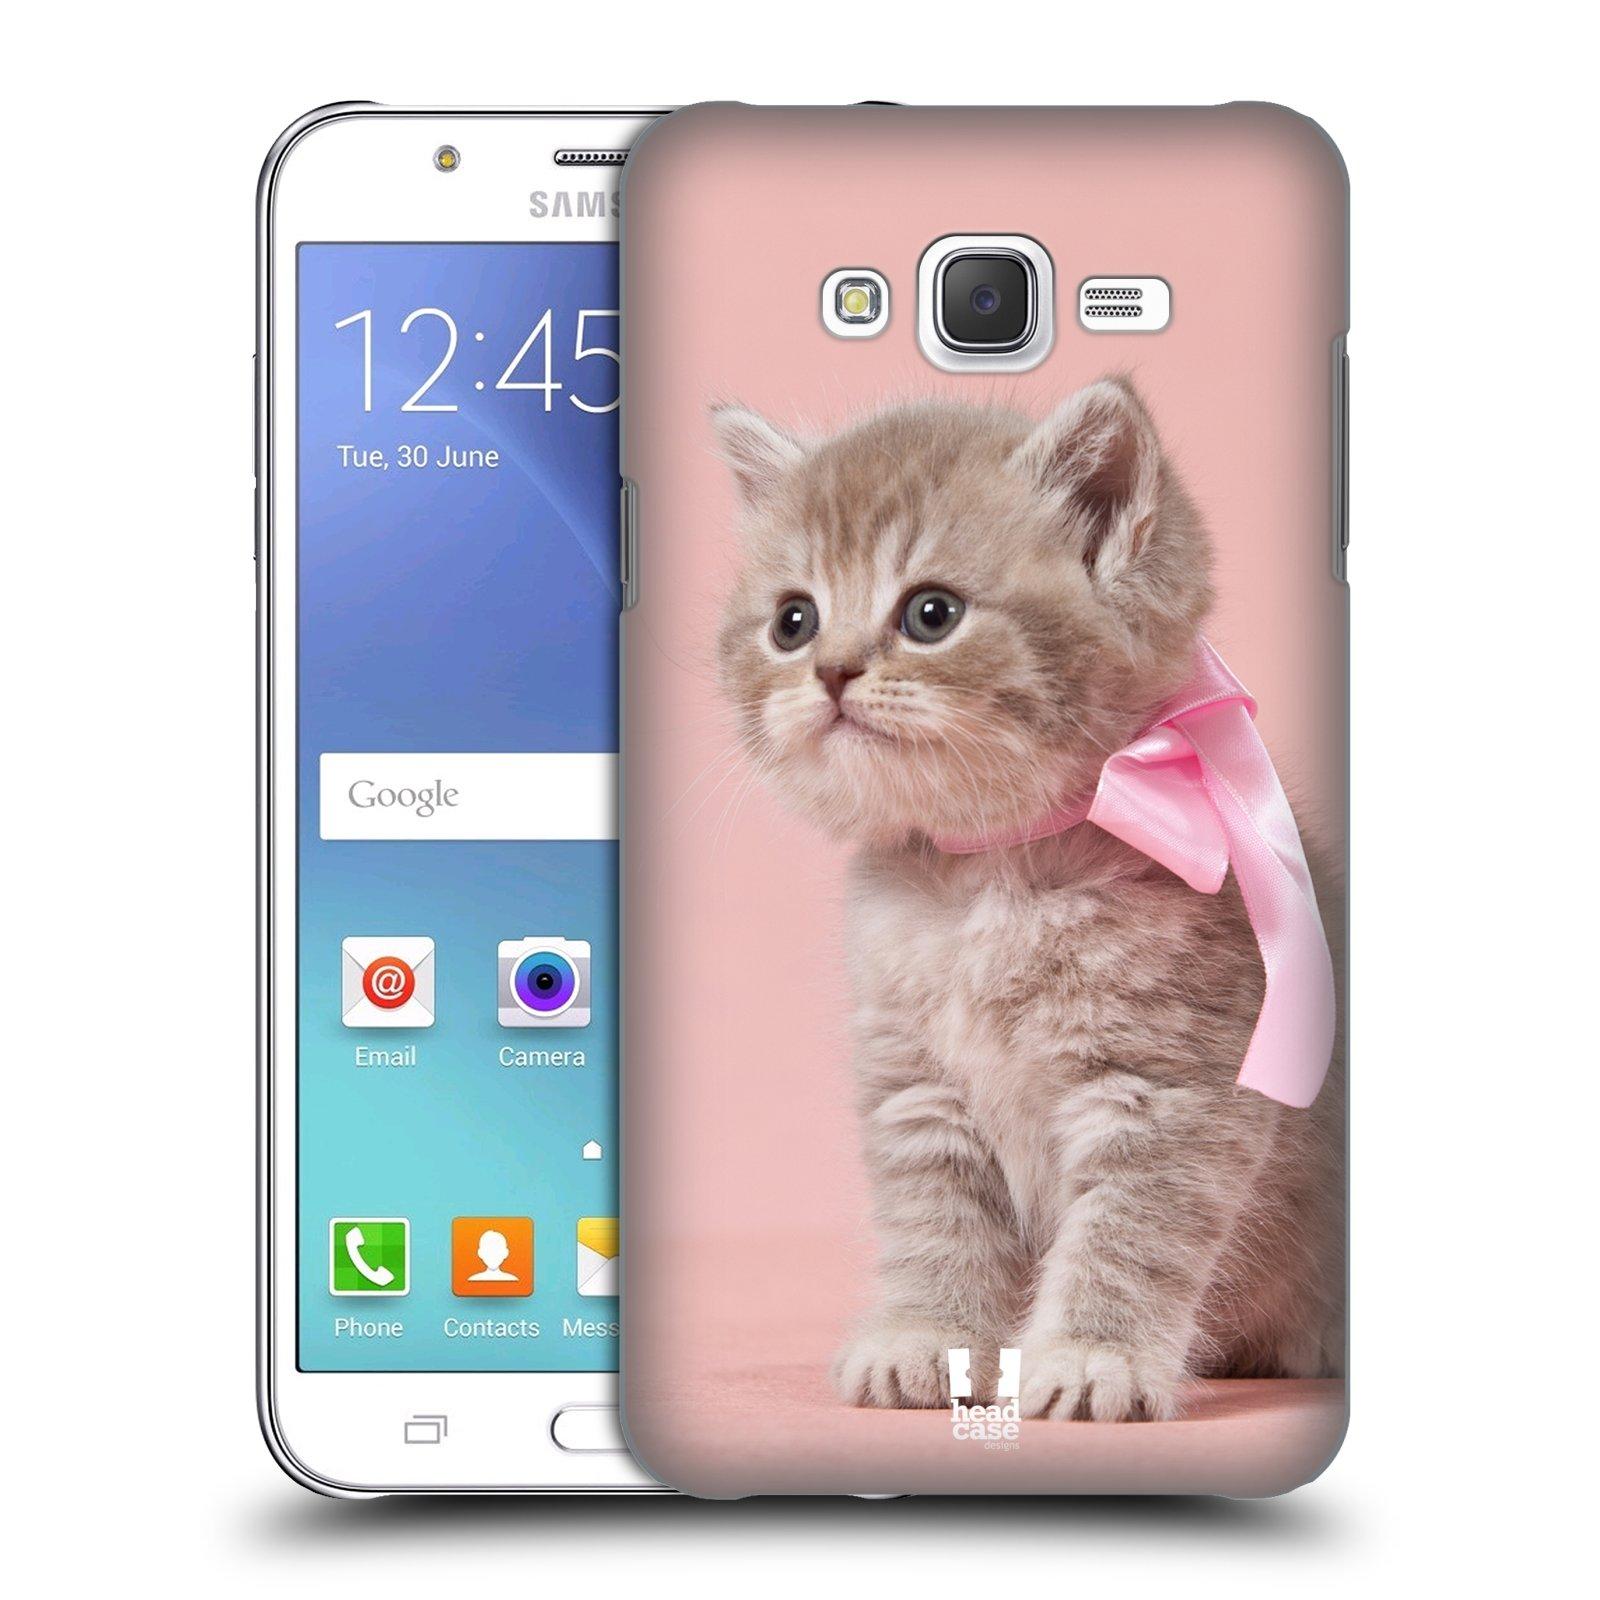 HEAD CASE plastový obal na mobil SAMSUNG Galaxy J7, J700 vzor Kočičky koťata foto kotě s růžovou mašlí